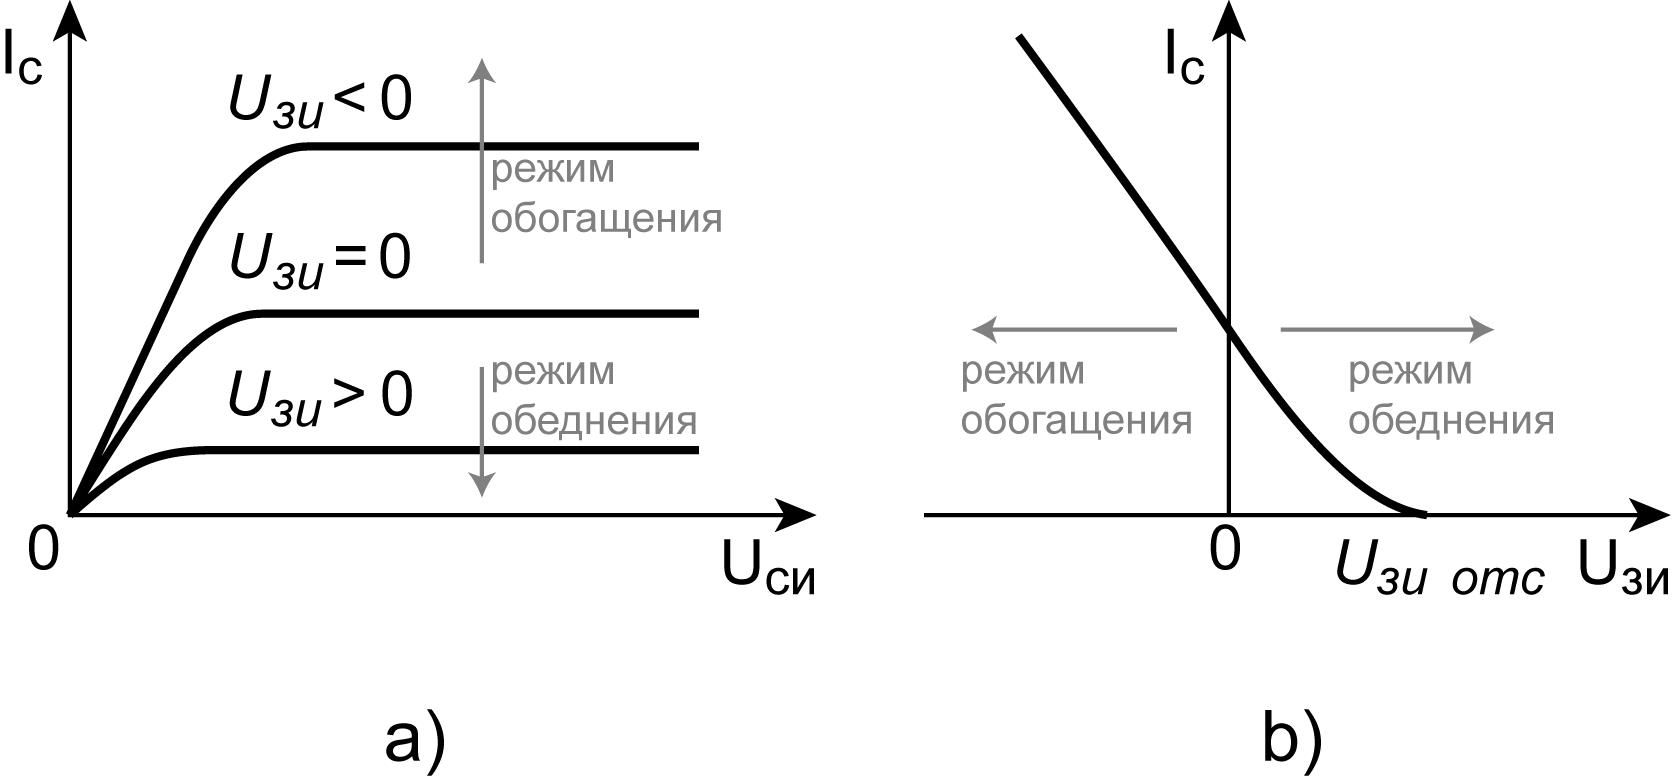 Мдп транзисторы схема